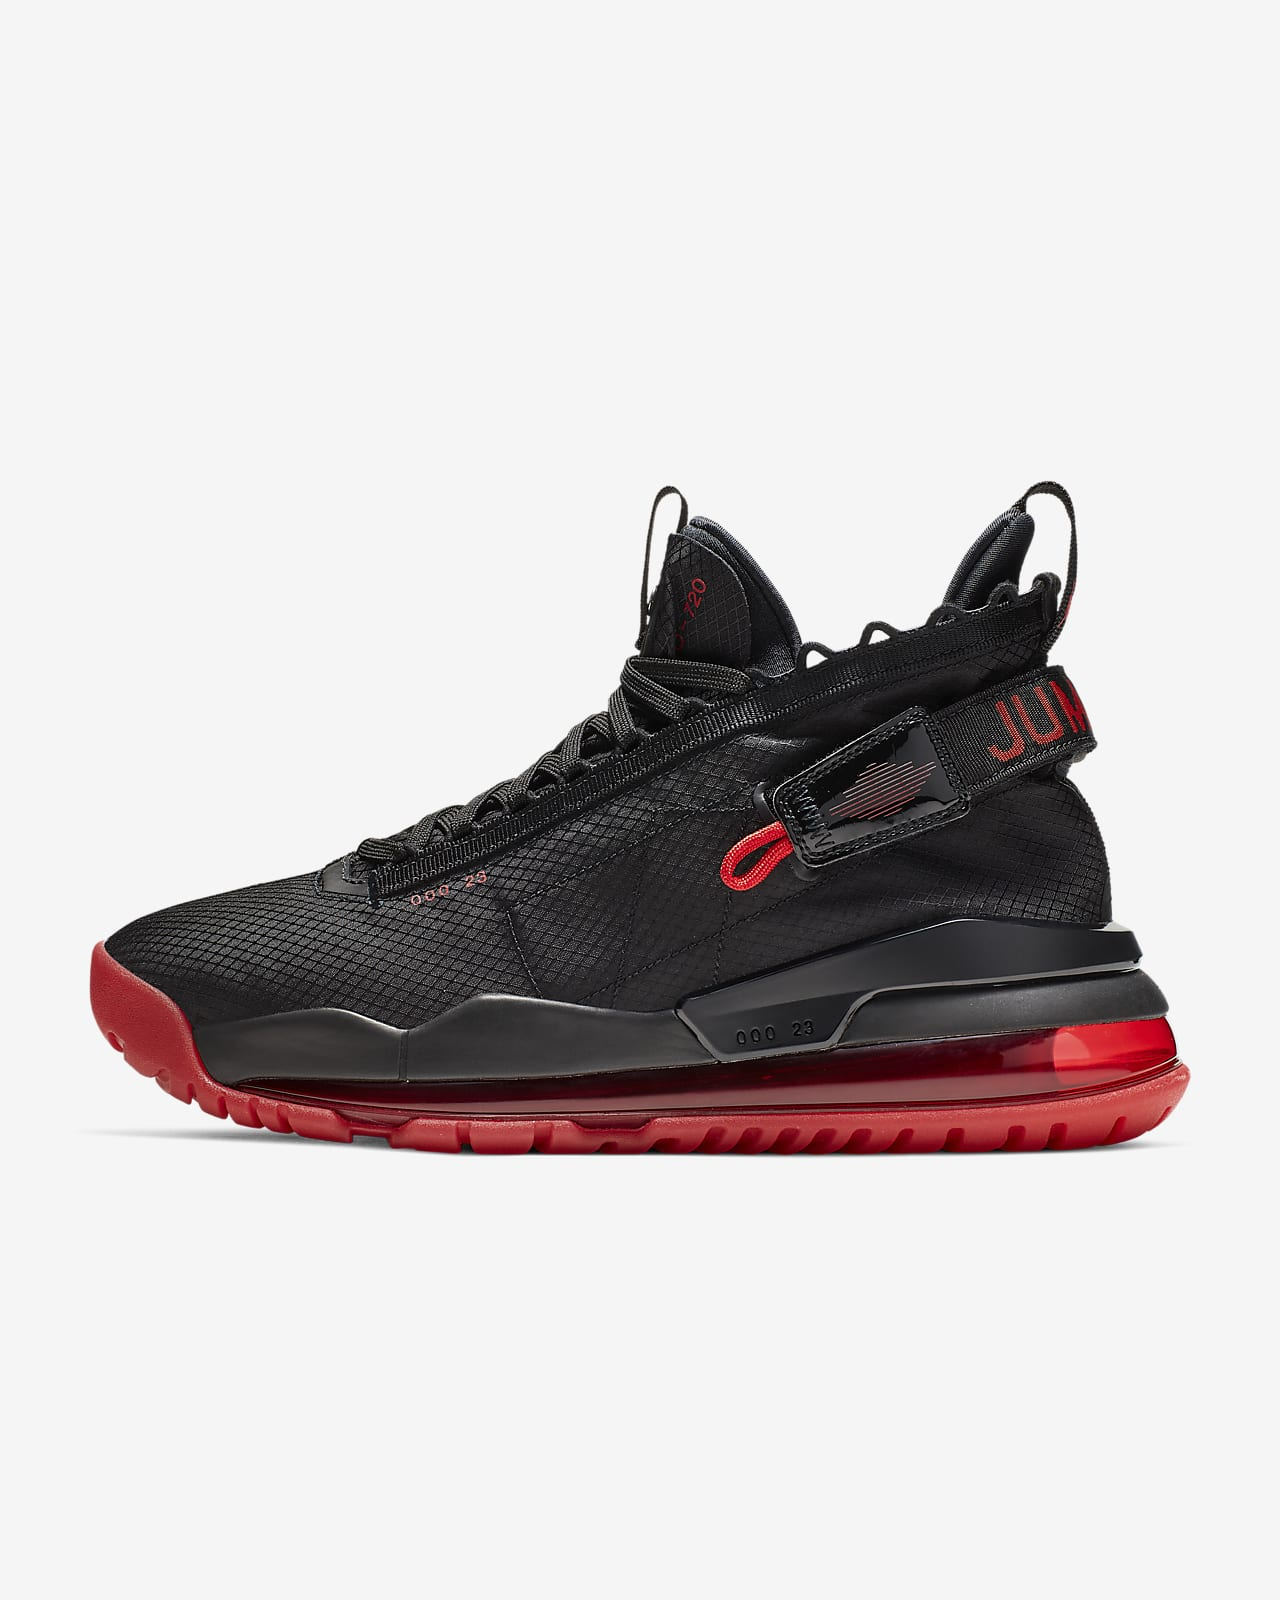 Jordan Proto-Max 720 鞋款